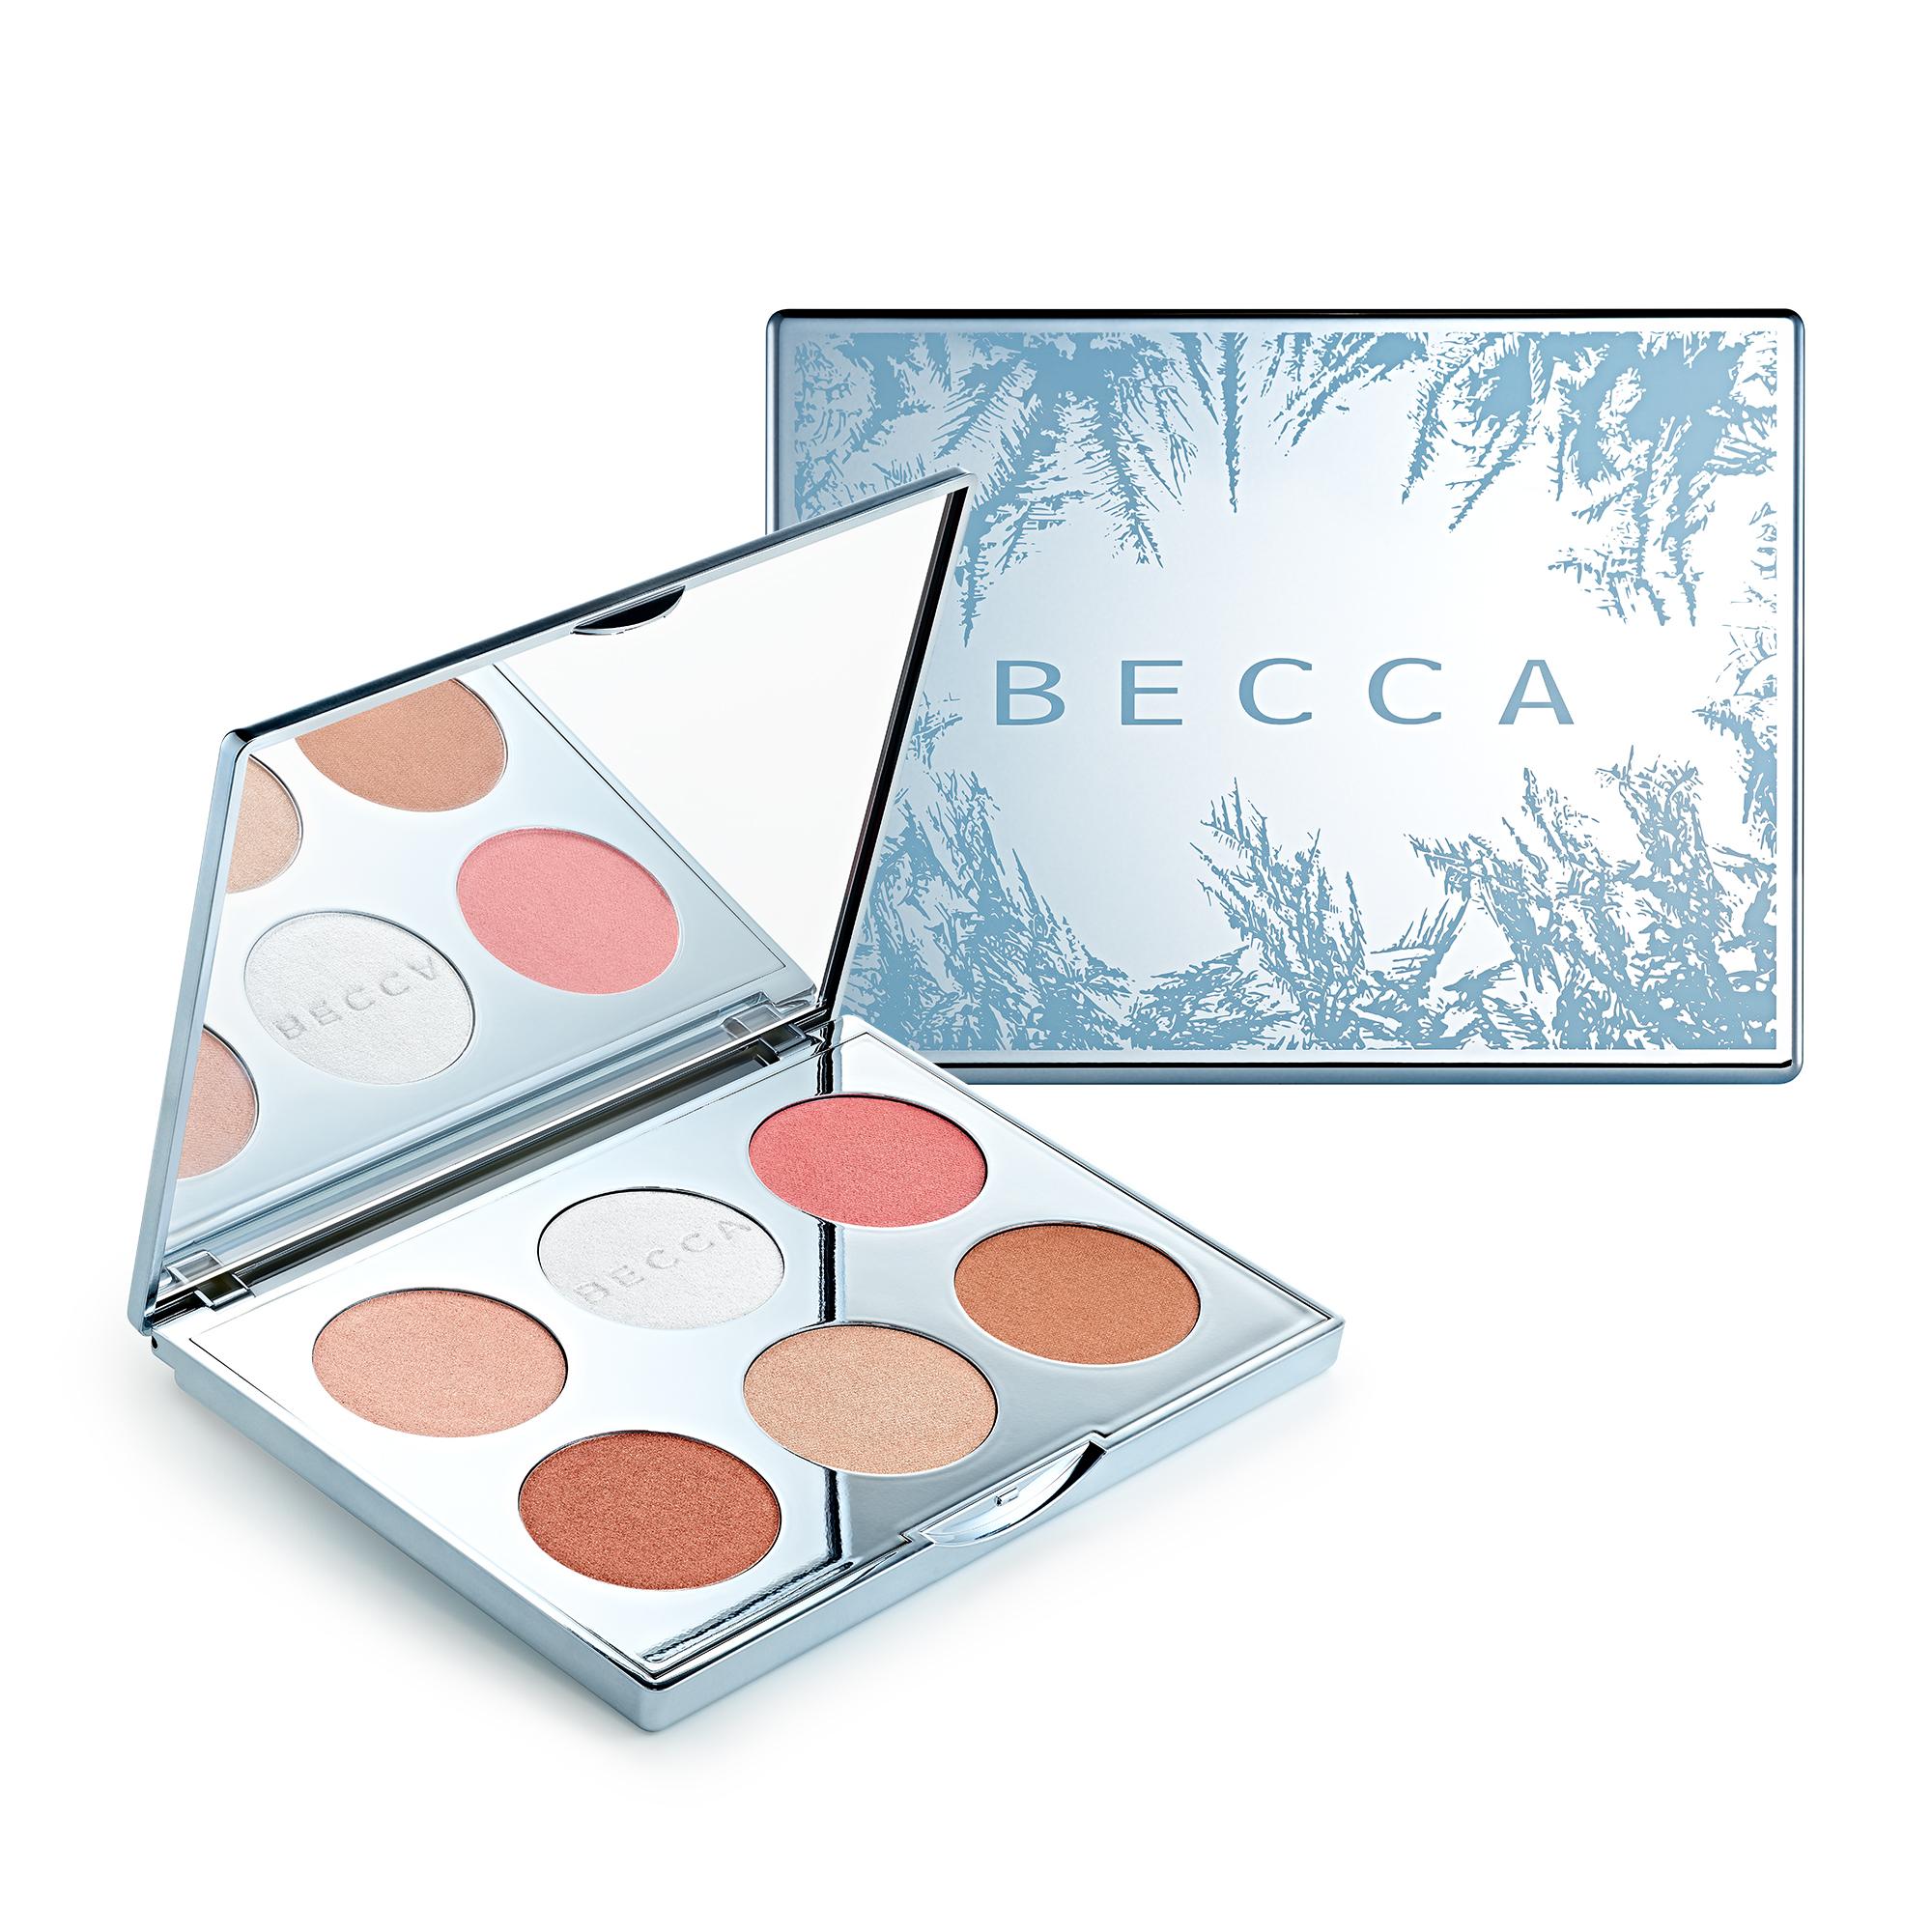 Collezioni makeup per l'inverno 2017: Becca Cosmetics, Kat Von D, MUFE, Urban Decay